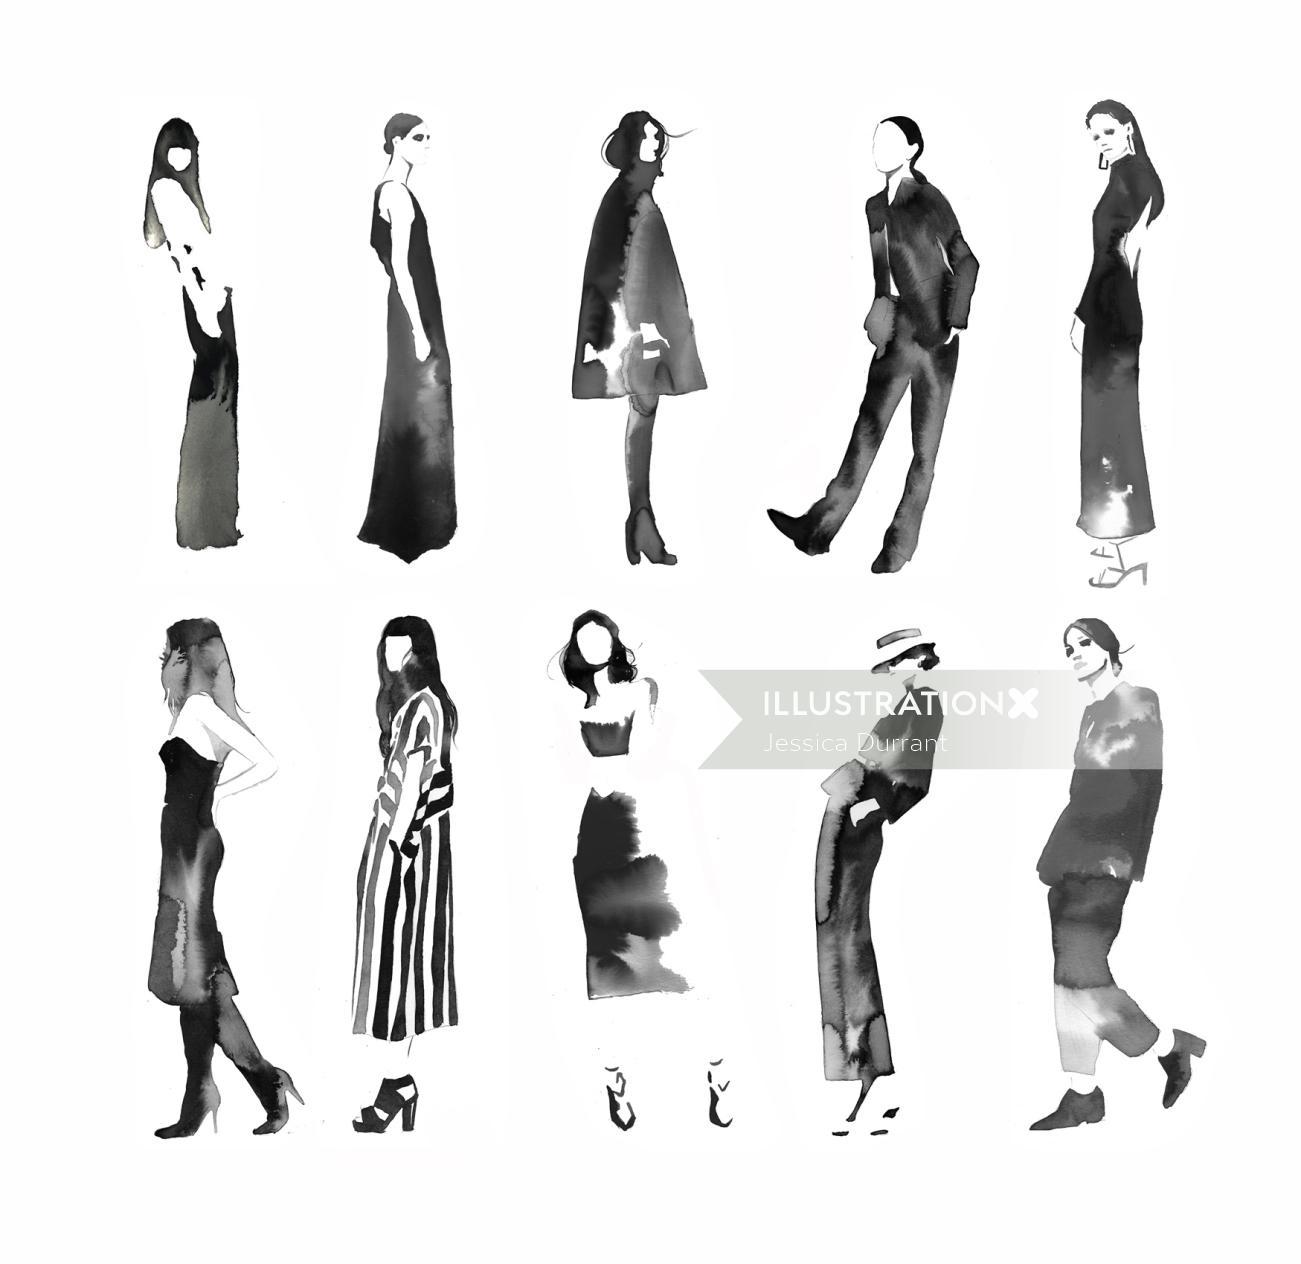 Fashion illustration of Black and white chicks